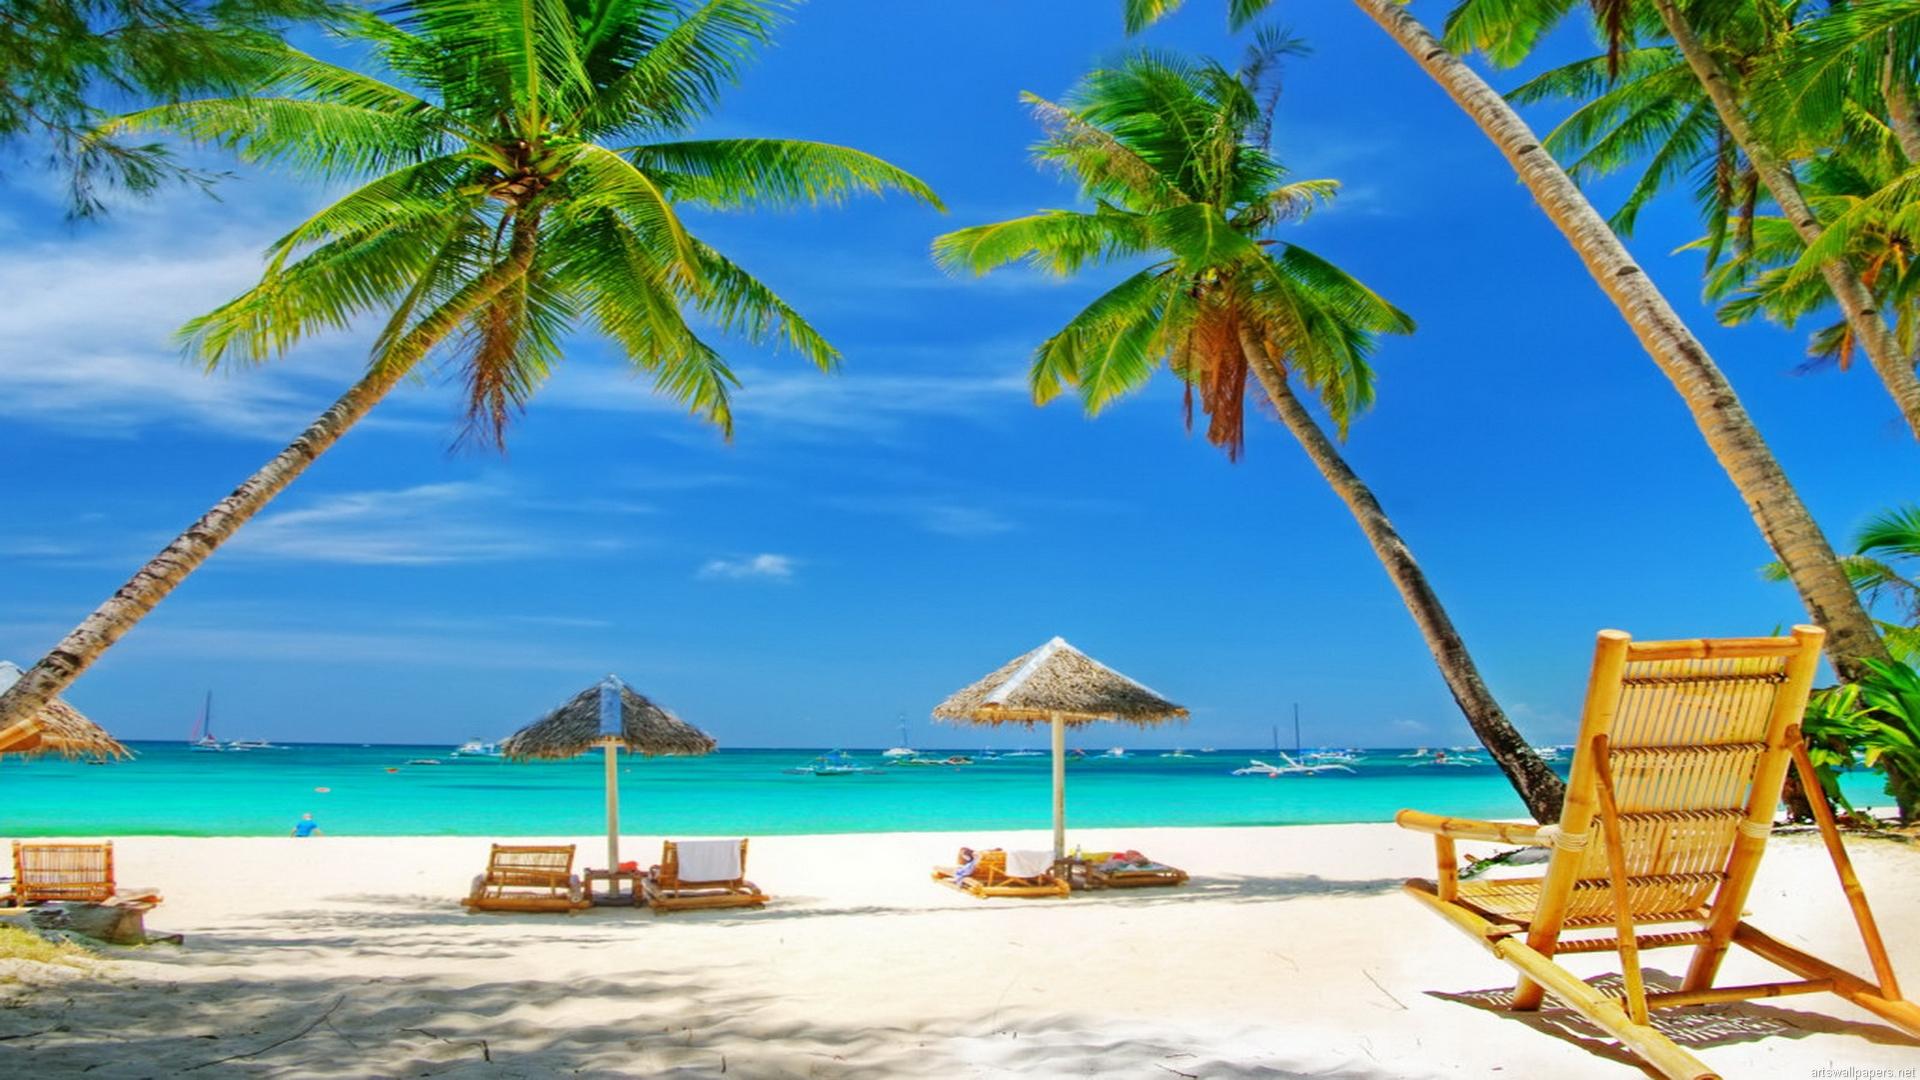 Free Download Beach Scene Wallpaper Full Desktop Backgrounds